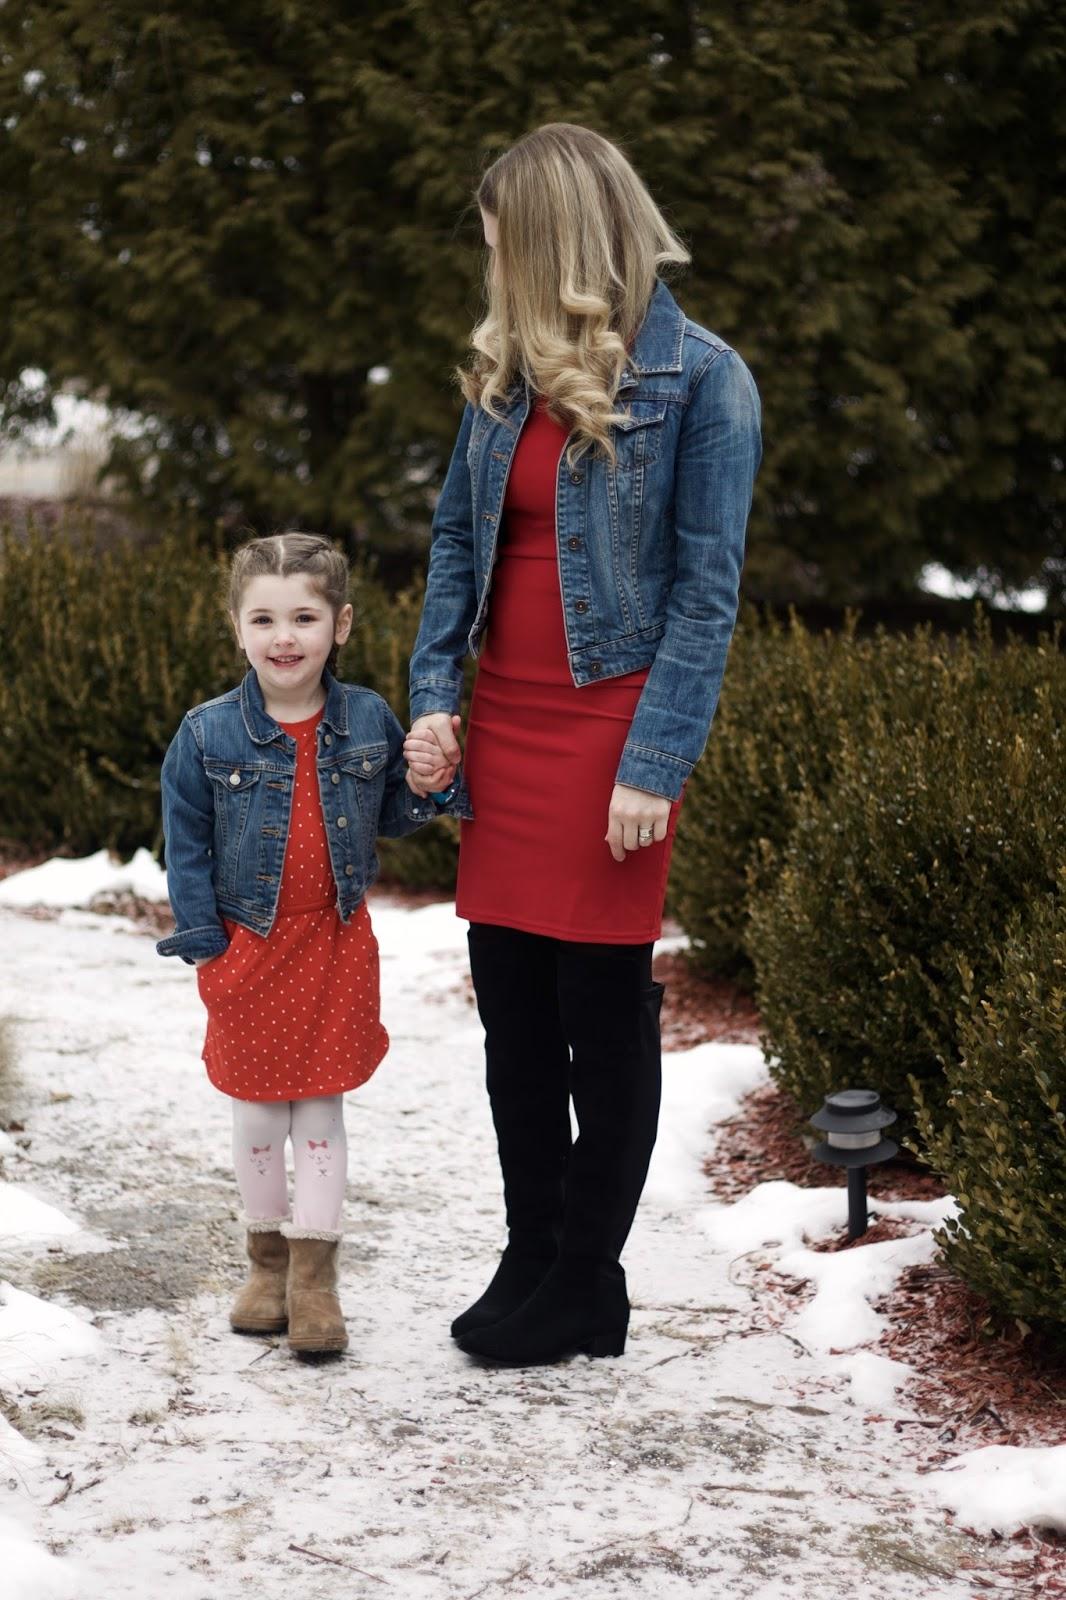 red dress, denim jacket, OTK black boots